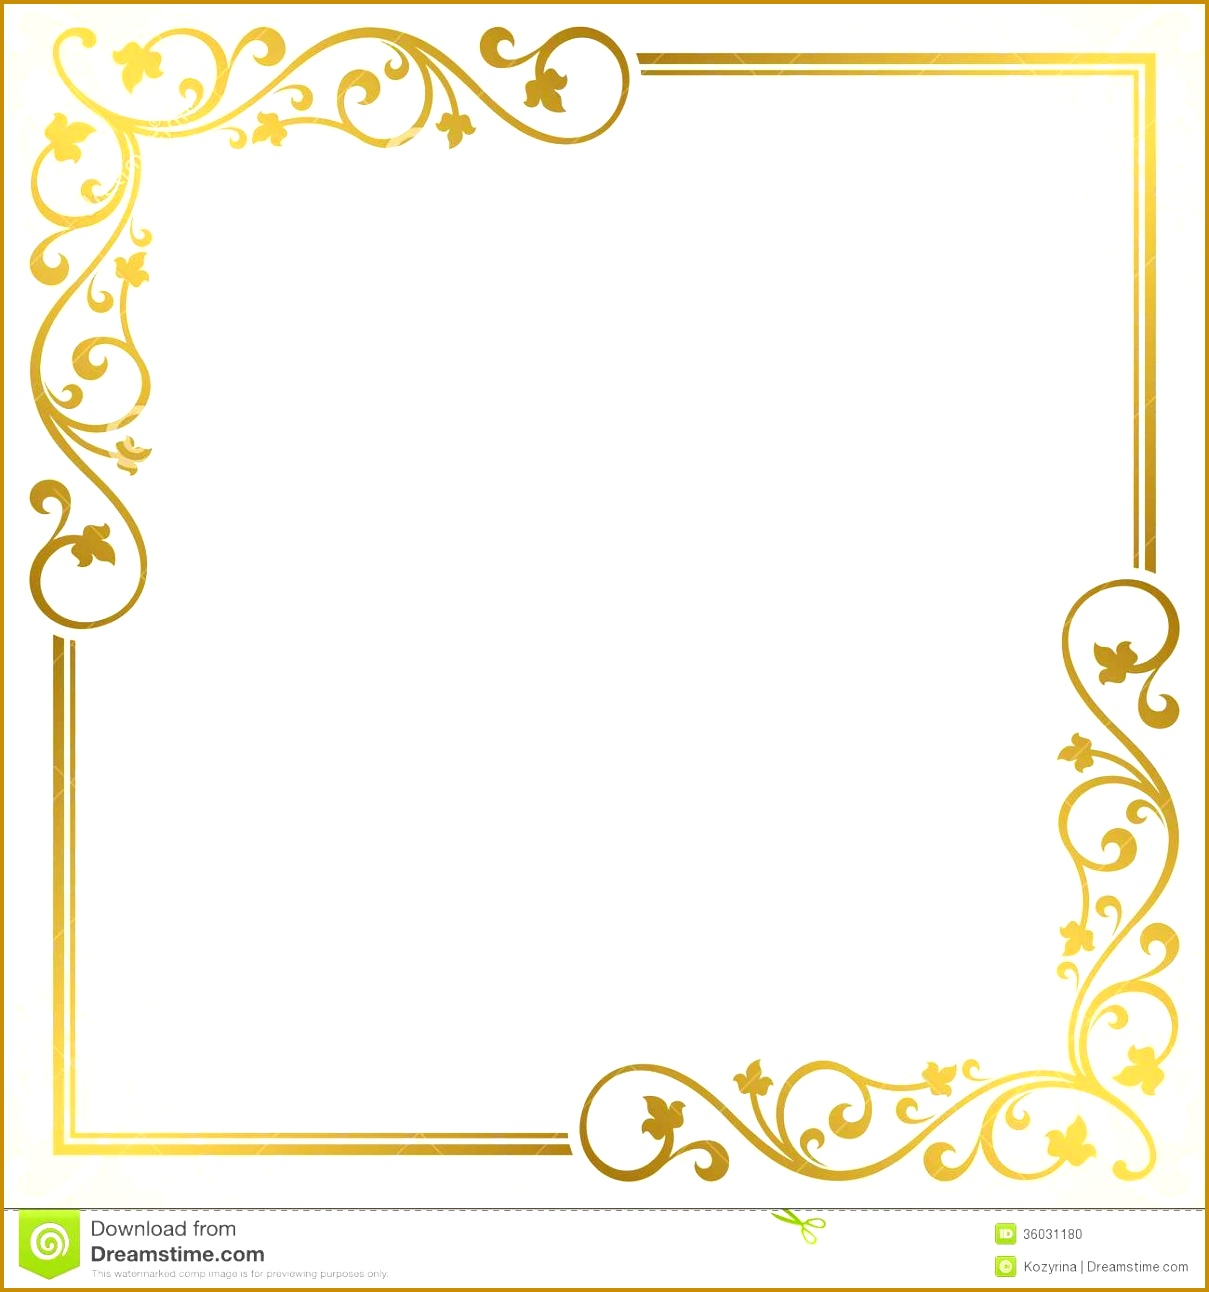 Formal Invitation Card Template Blank Blank Wedding Invitation Card Template Matik For 12091292